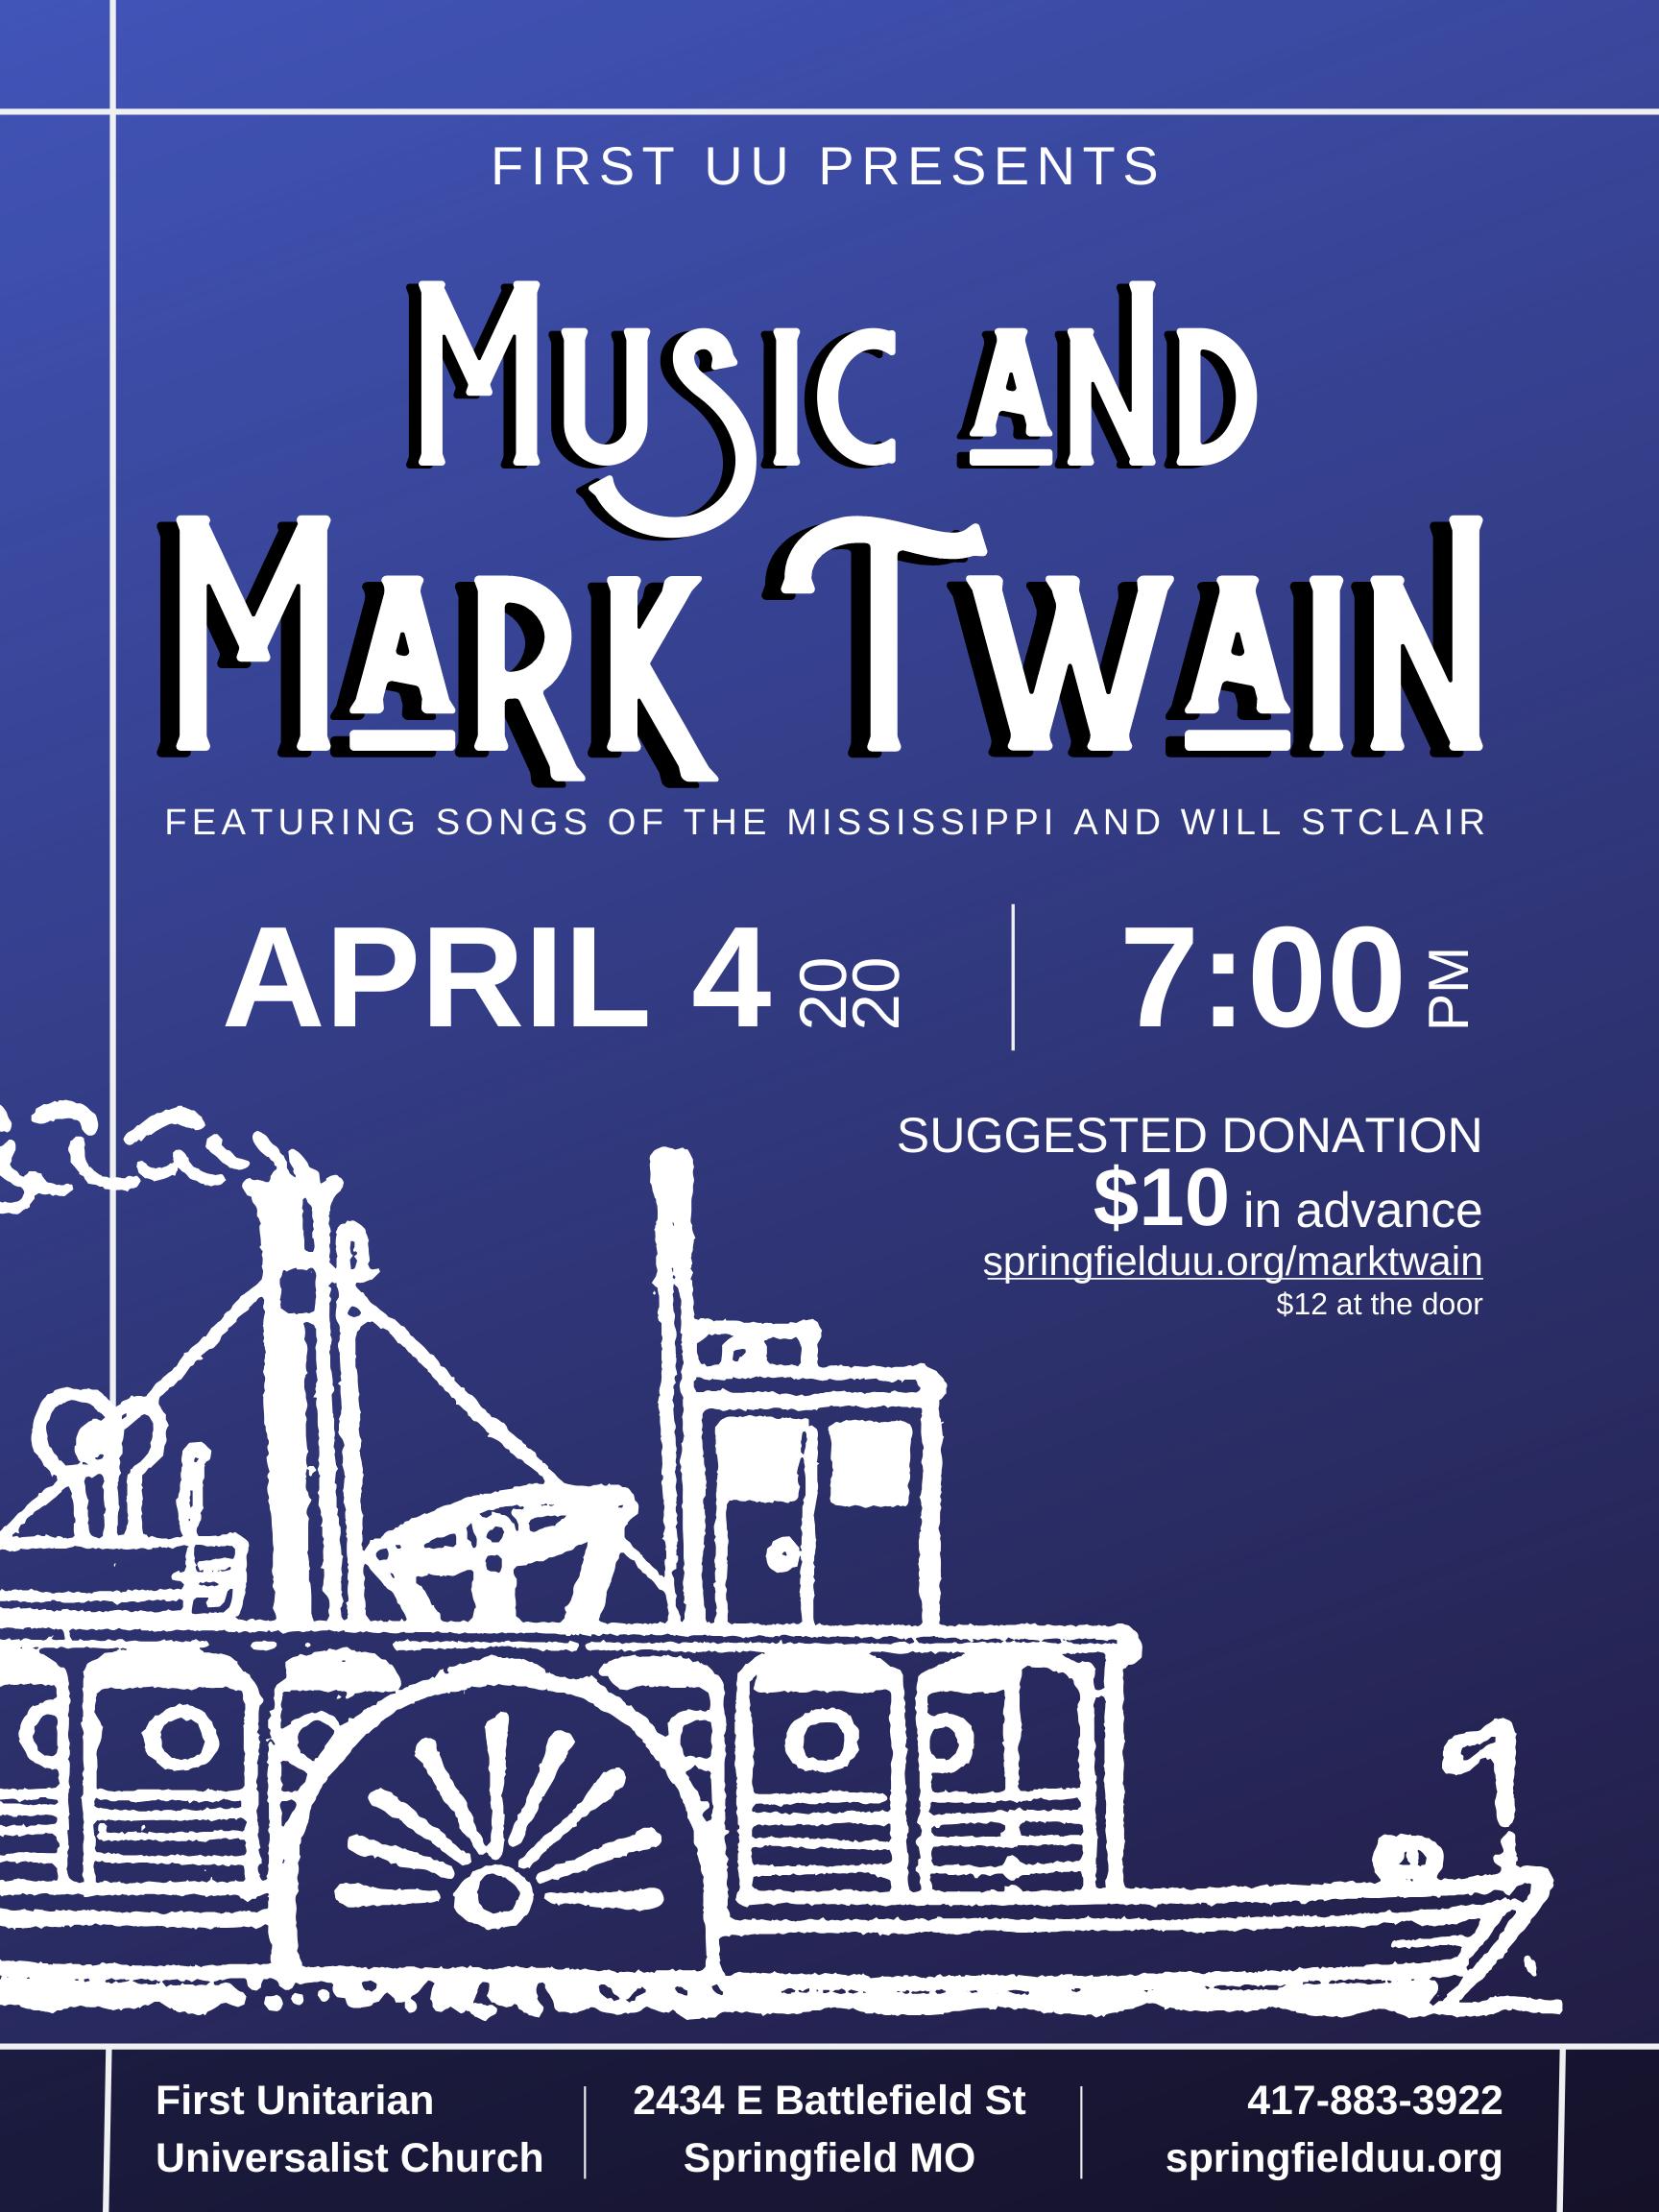 Music and Mark Twain